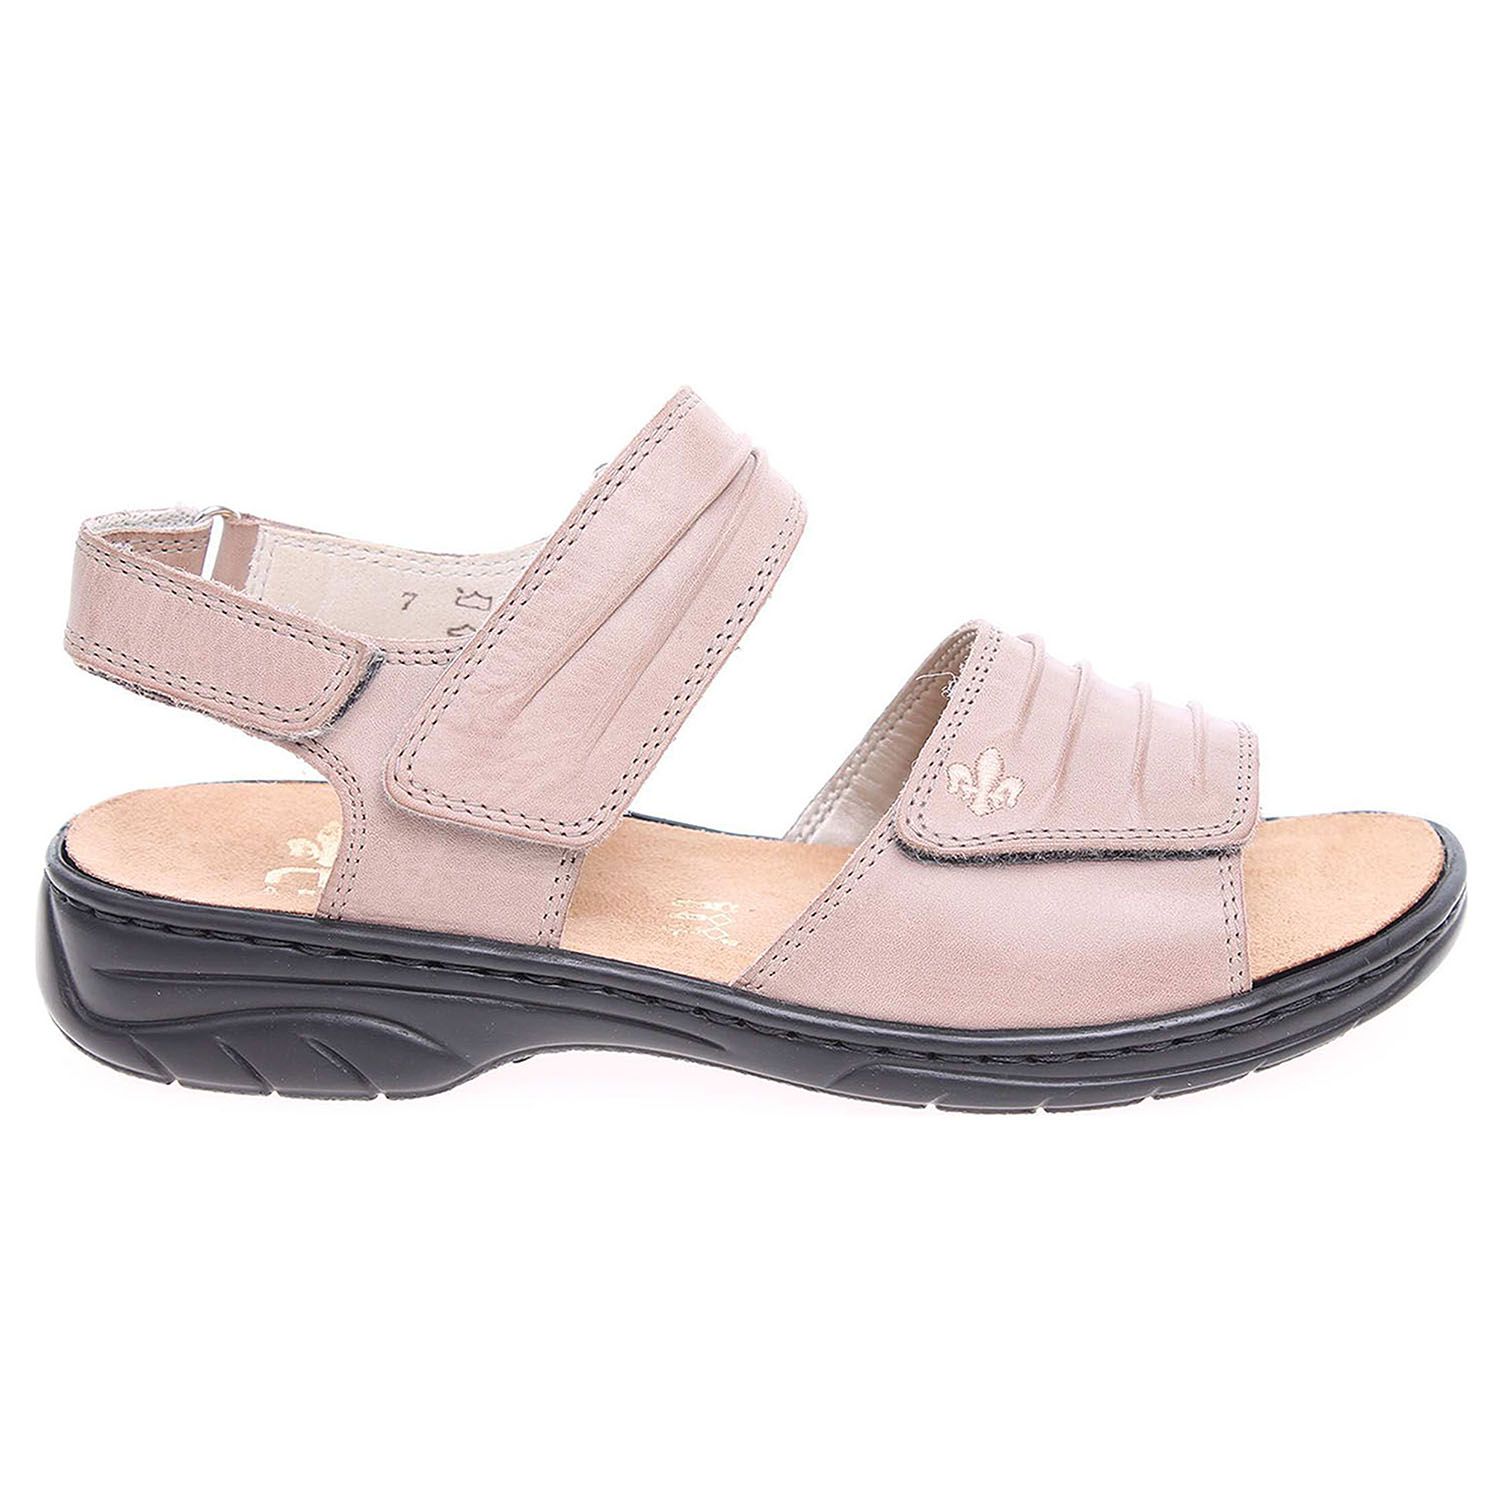 Rieker dámské sandály 64560-42 béžové 38